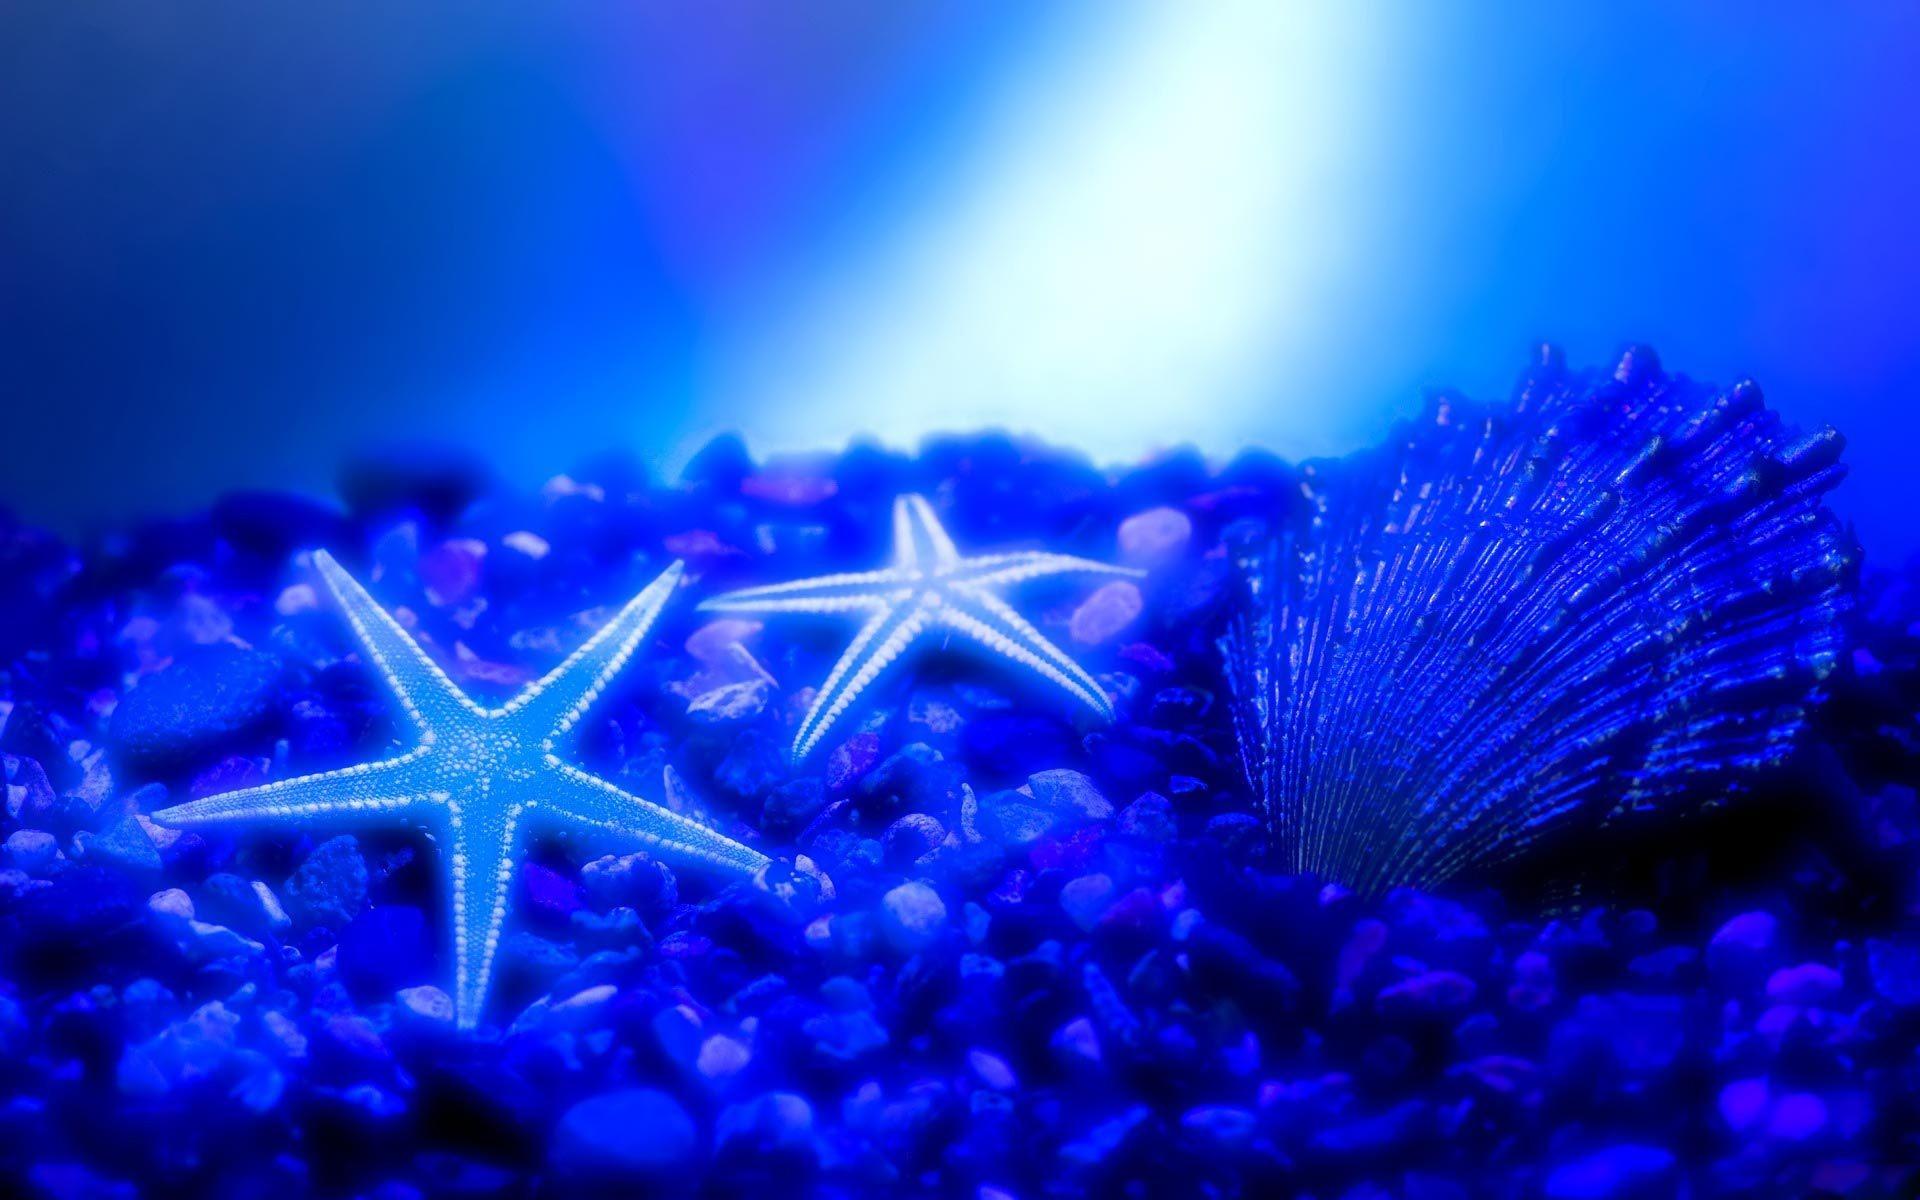 Seabed Nature Desktop Wallpaper Hd Electric Blue